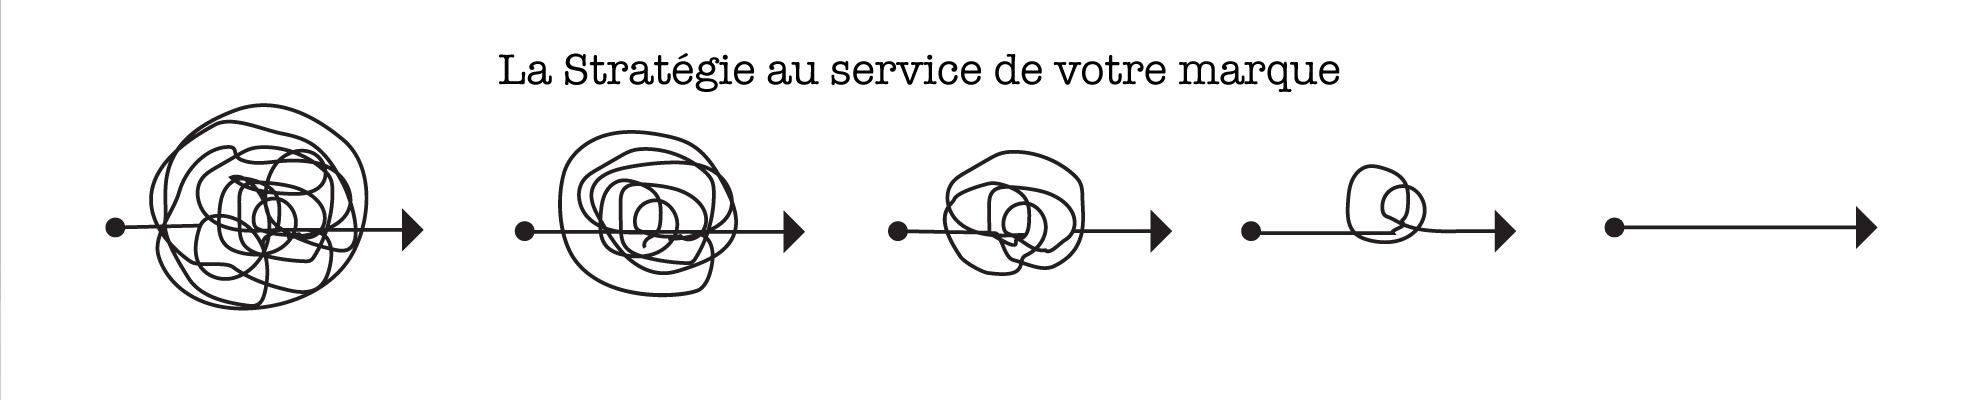 strategie-marque-innovation-leadscom-plateforme-positionnement